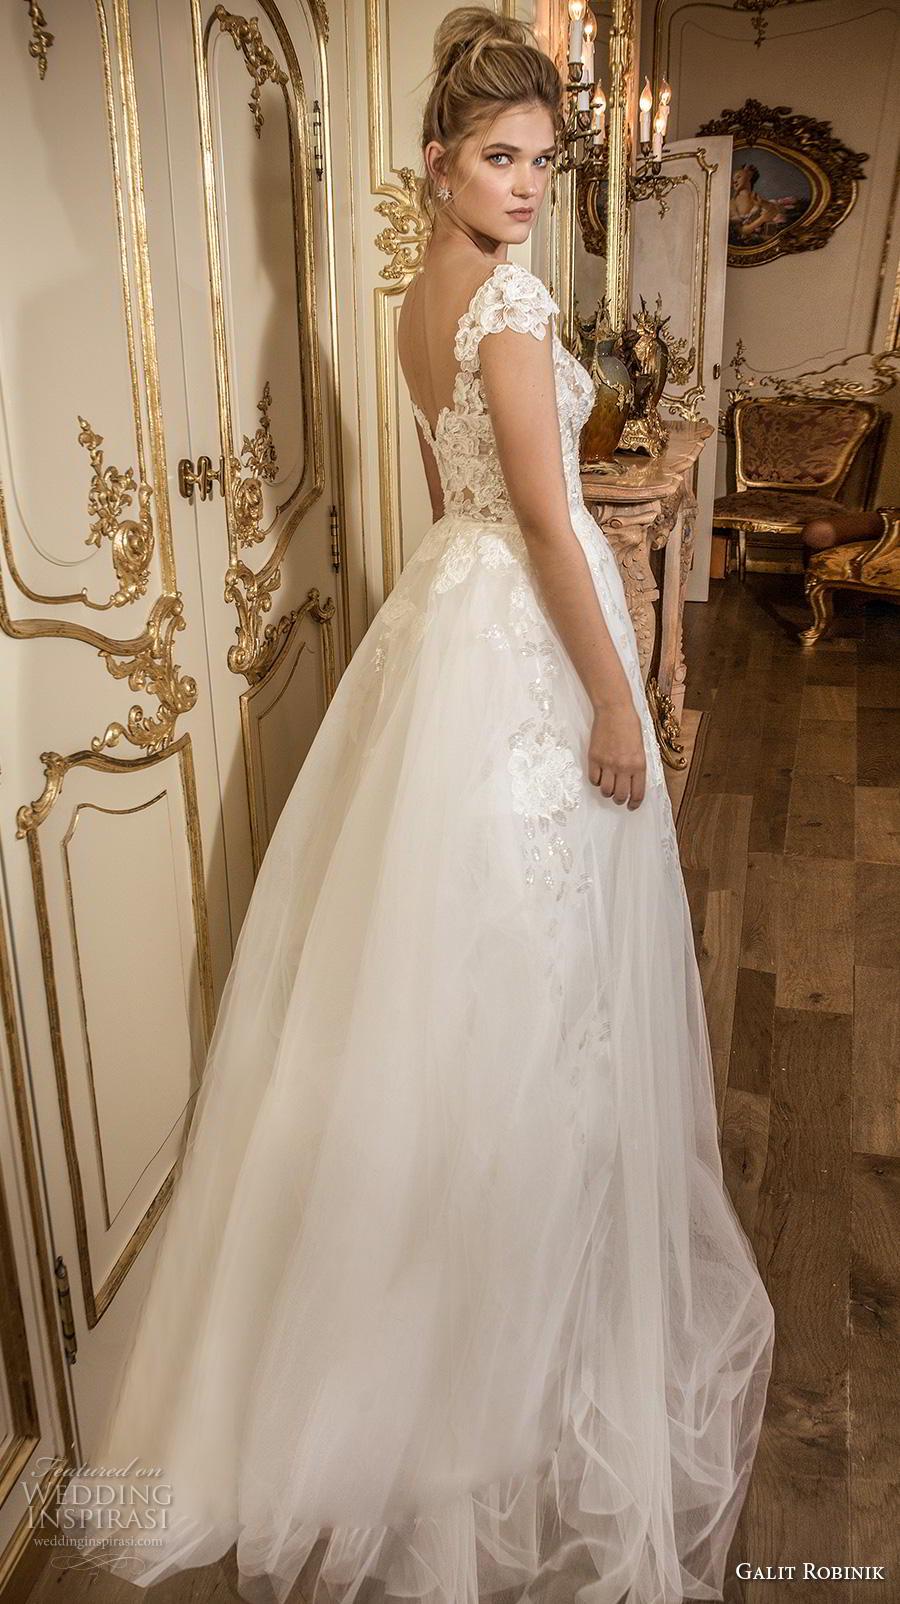 galit robinik 2019 bridal cap sleeves scoop neckline heavily embellished bodice romantic a  line wedding dress mid back sweep train (3) bv